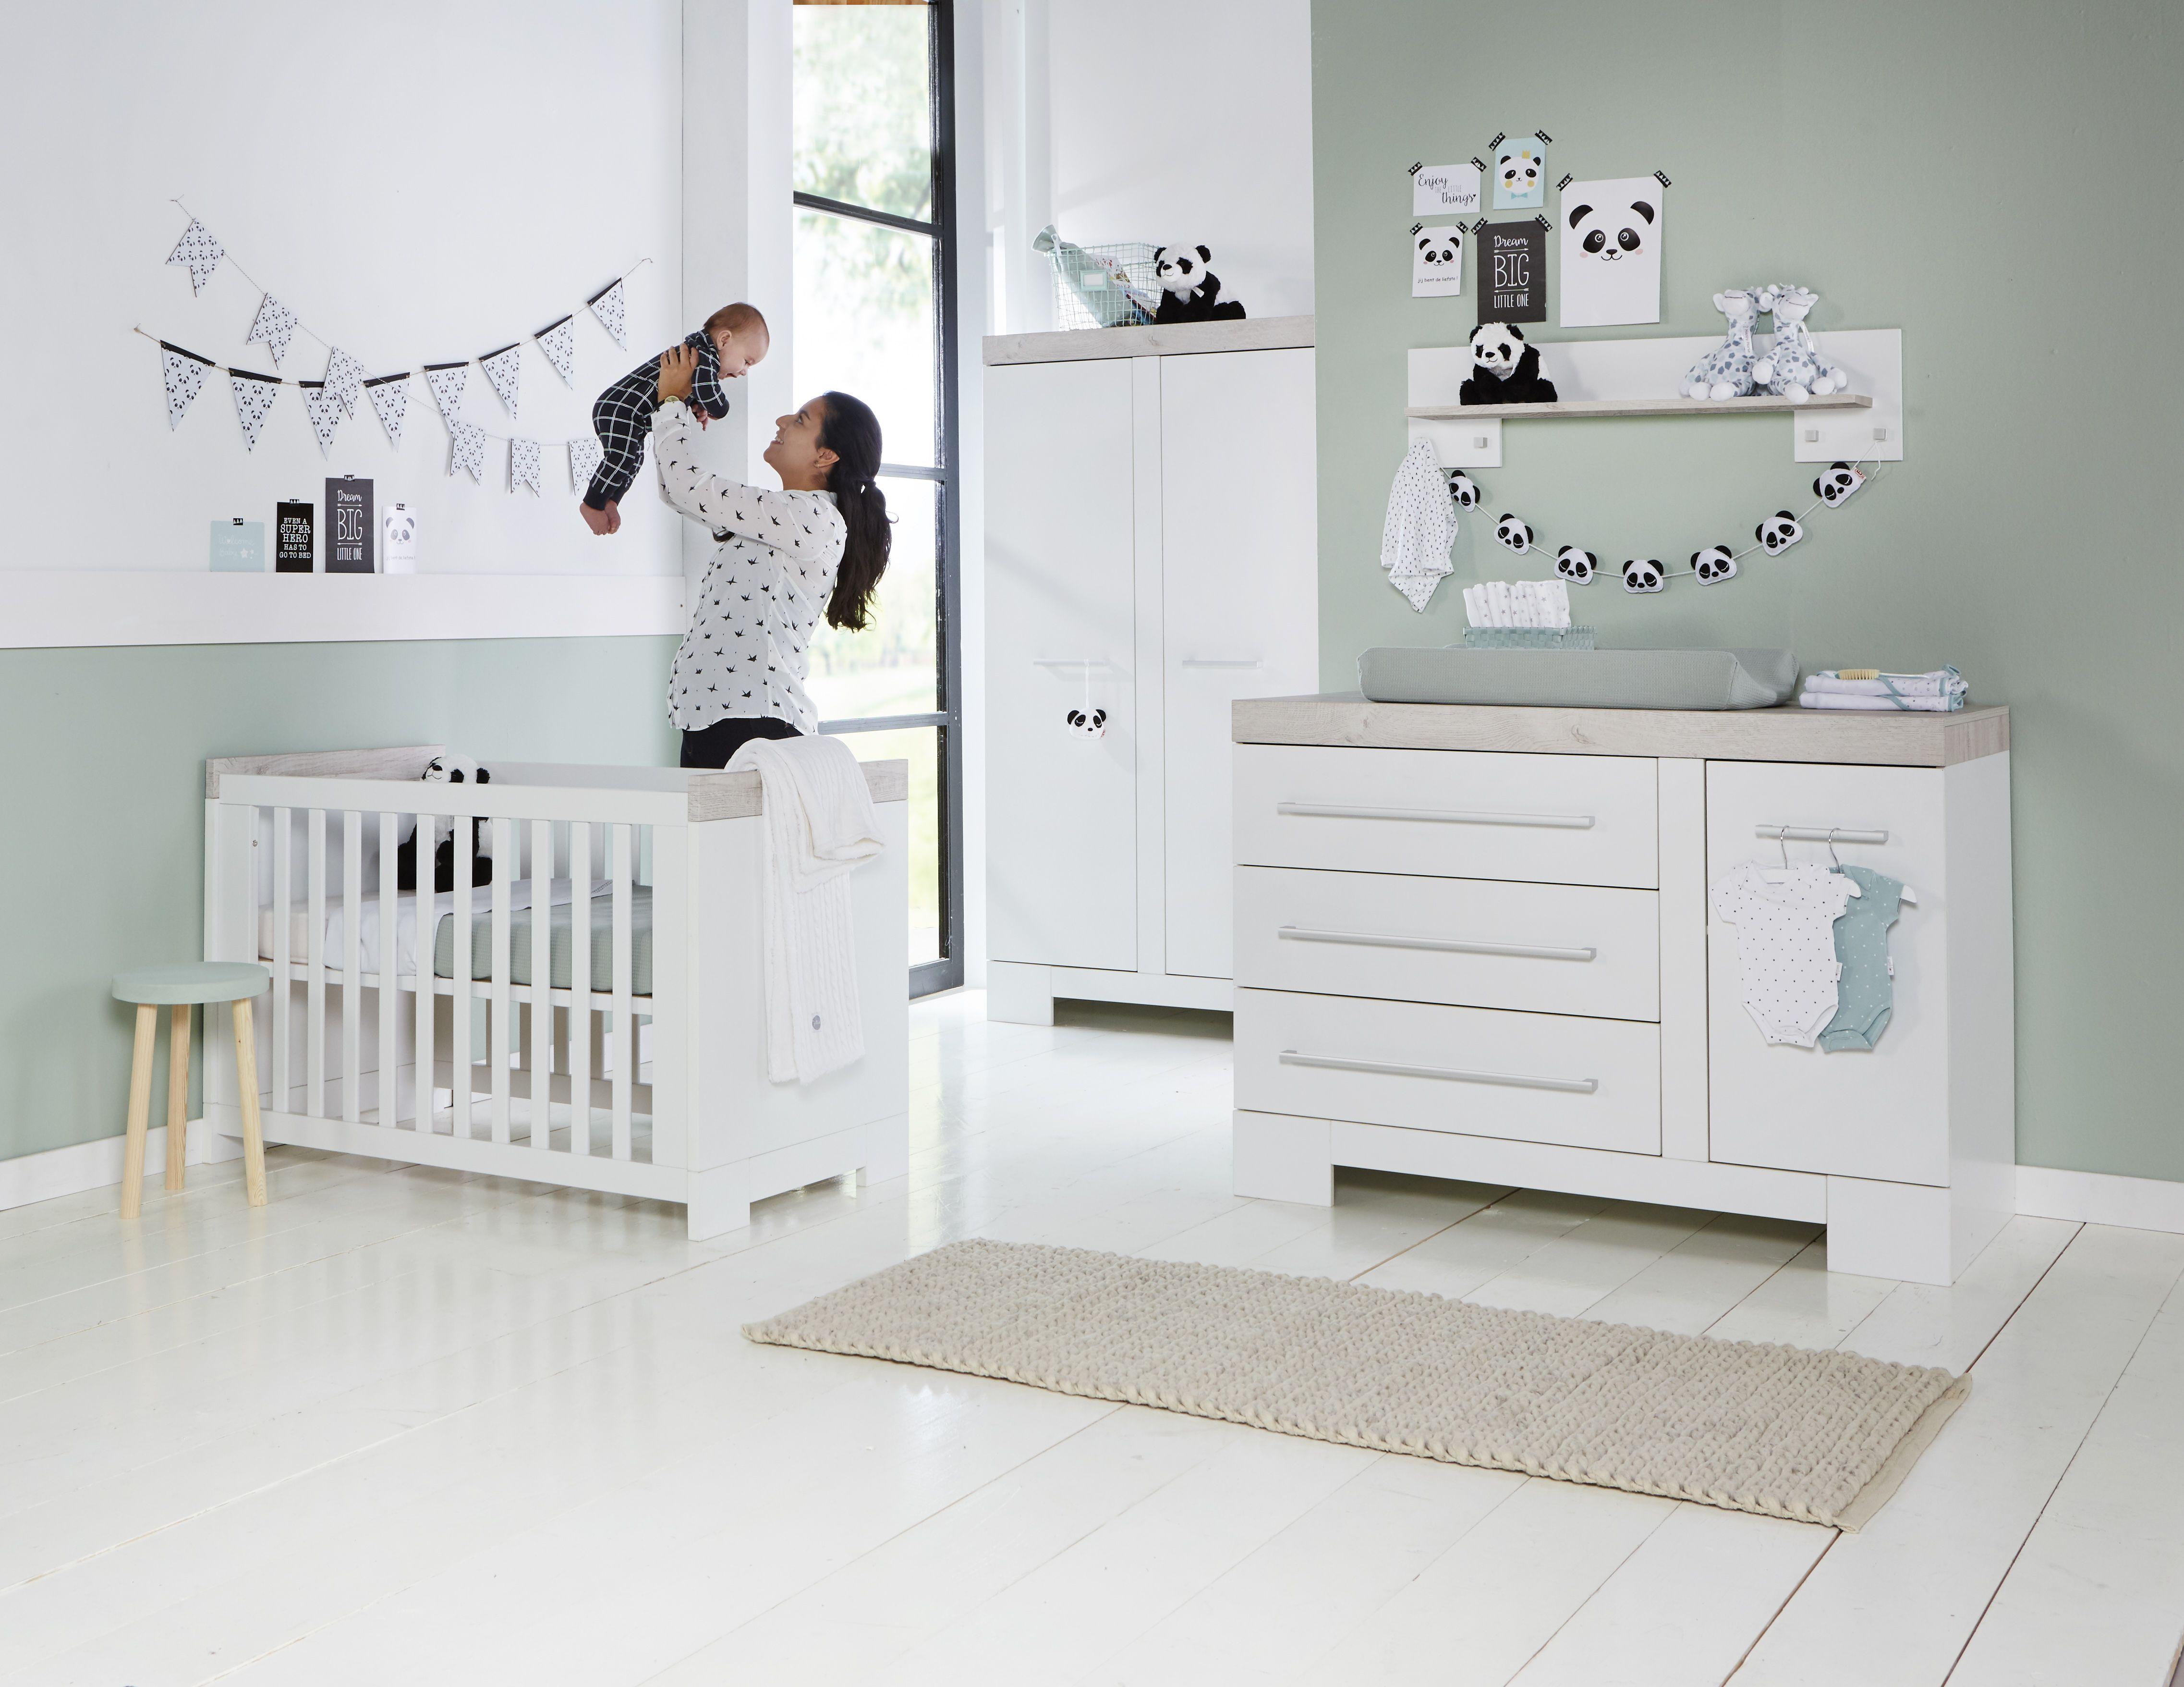 Coole Letters Babykamer : Babykamer futura van het merk twf panda products of fabs world